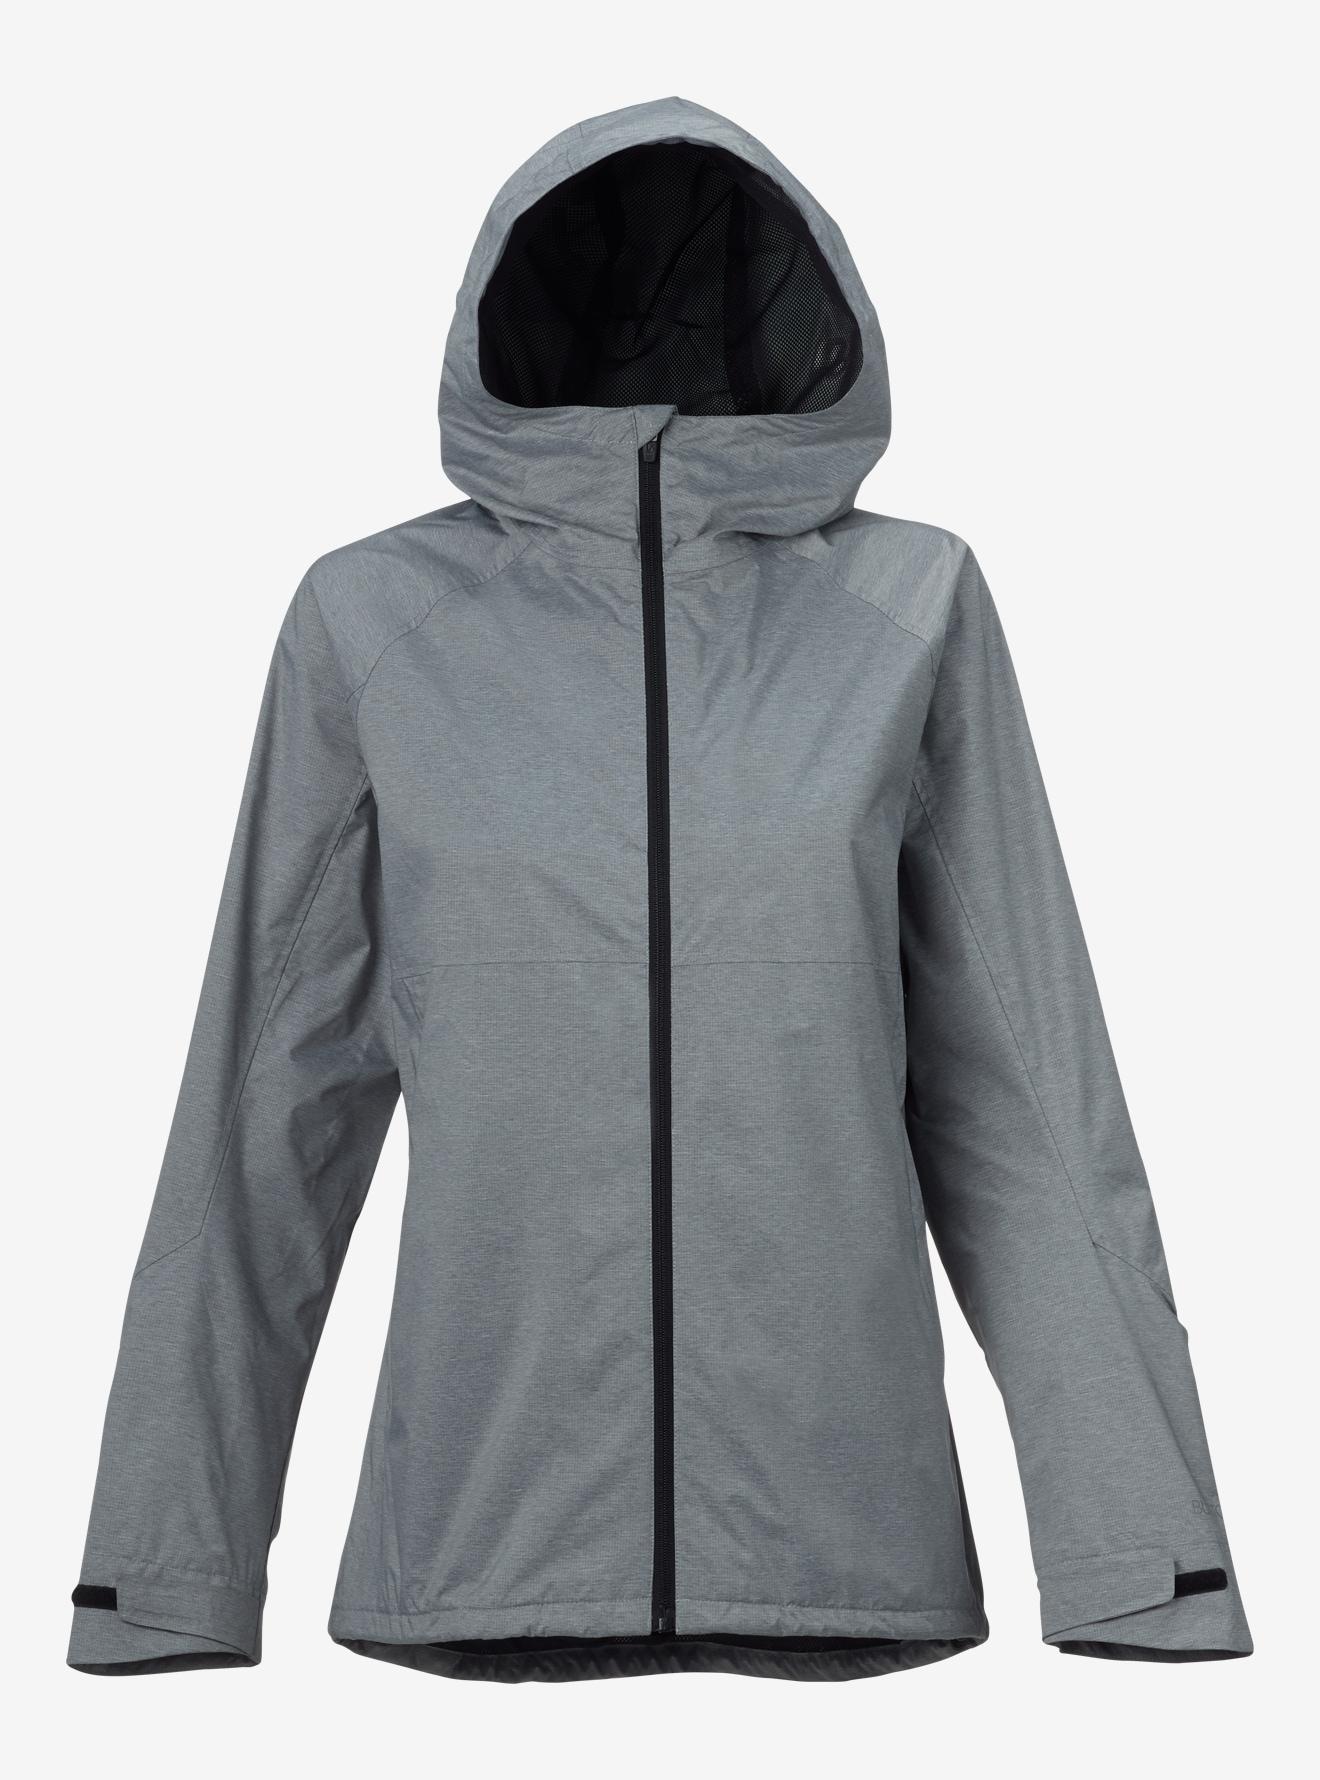 Burton Girls' Berkley Rain Jacket shown in True Black Heather